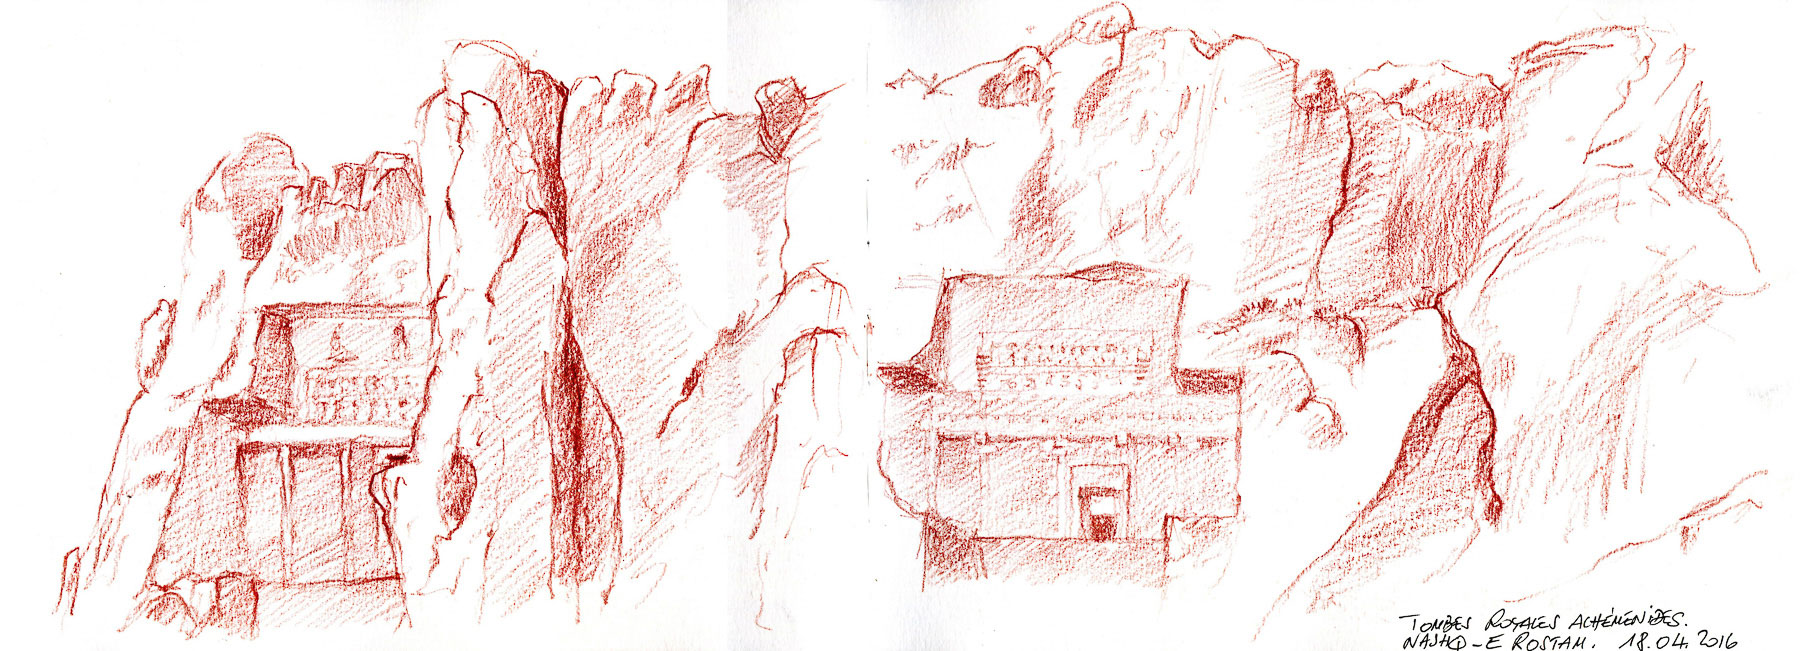 tombes-nashq-e-rostah-1800